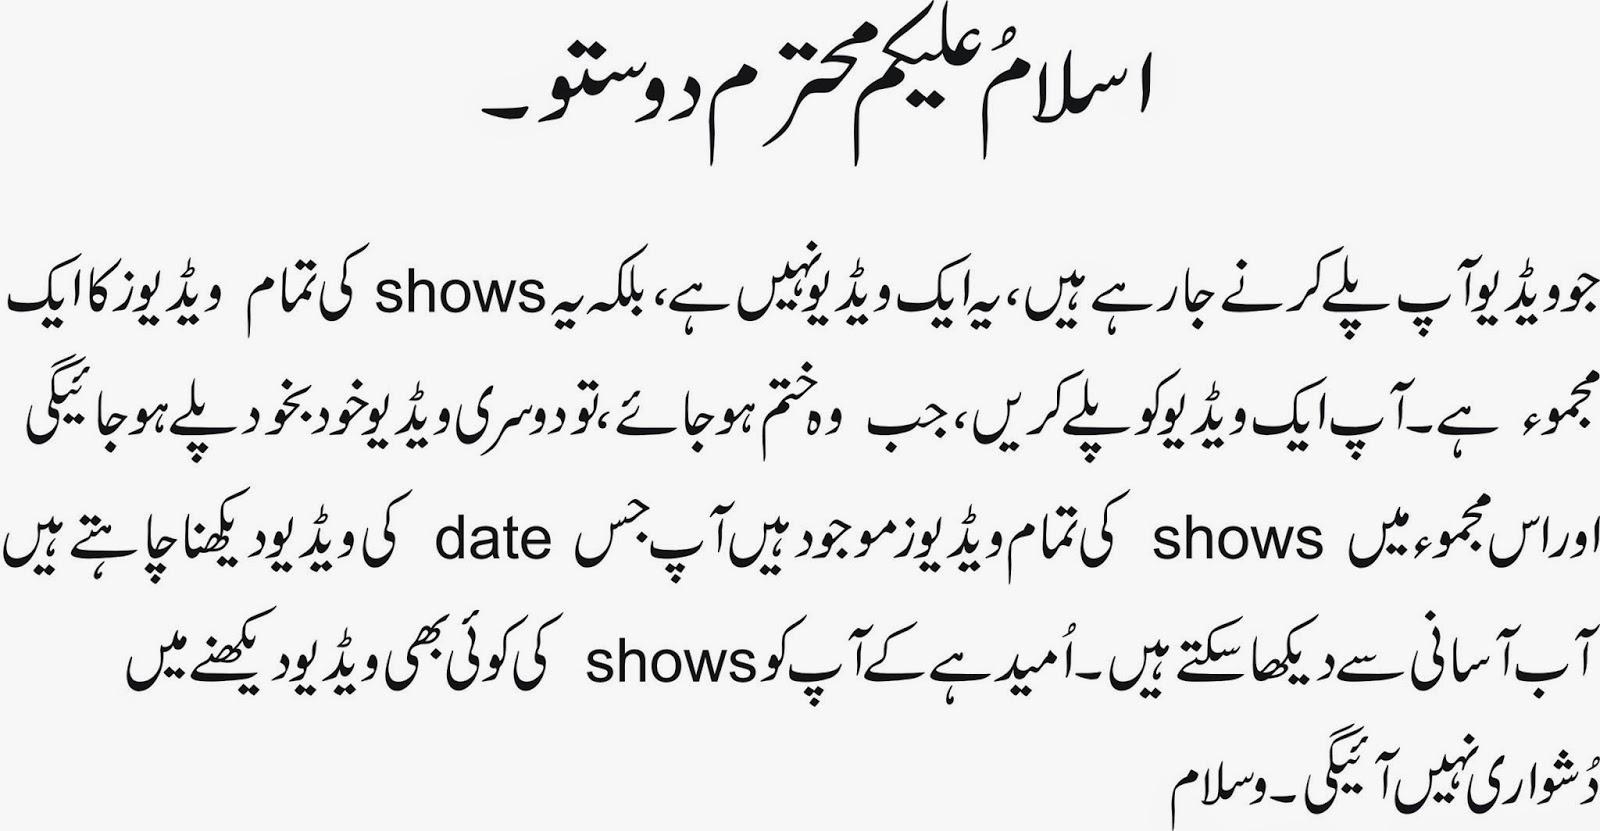 Handi Recipes Zubaida Tariq Masala TV Show Feb 13, 2015 - Masala TV ...